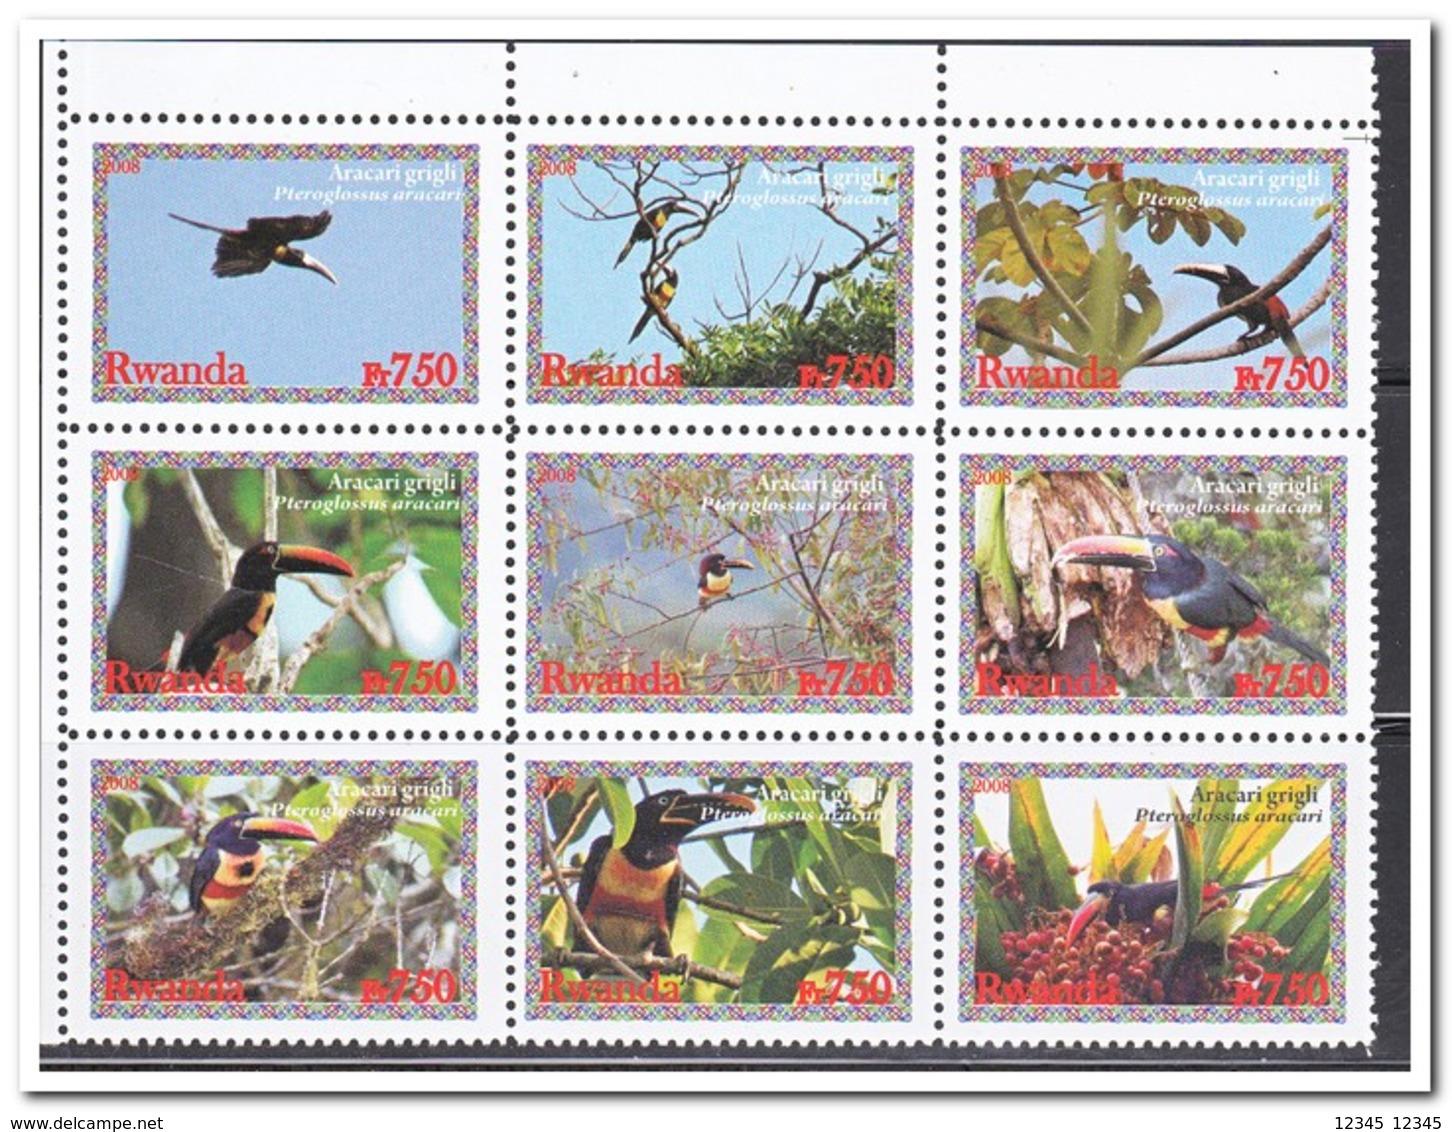 Rwanda 2008, Postfris MNH, Birds - Rwanda